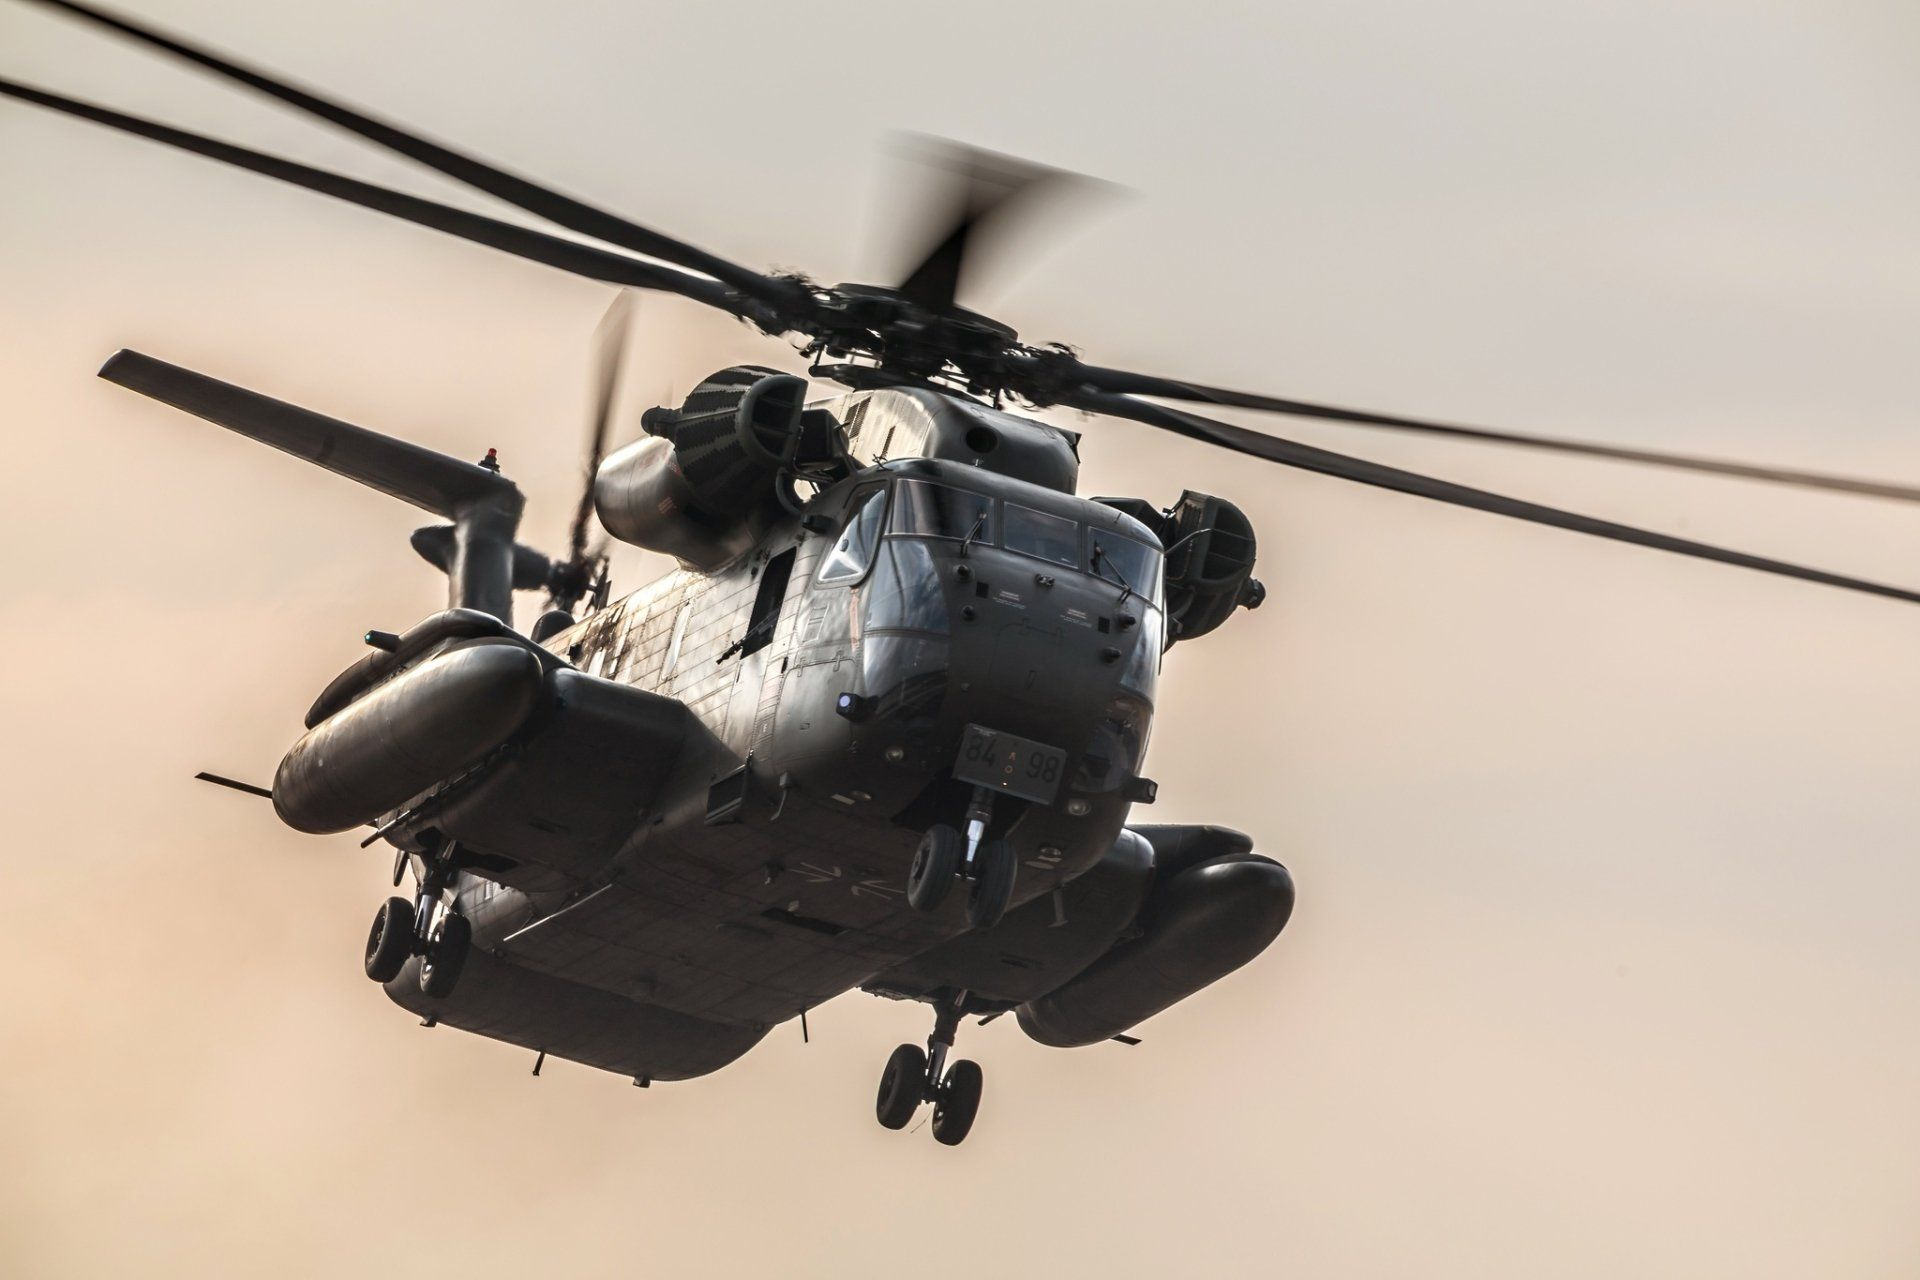 2048x1365 Sikorsky Ch 53 Sea Stallion Imágen De Fondo De